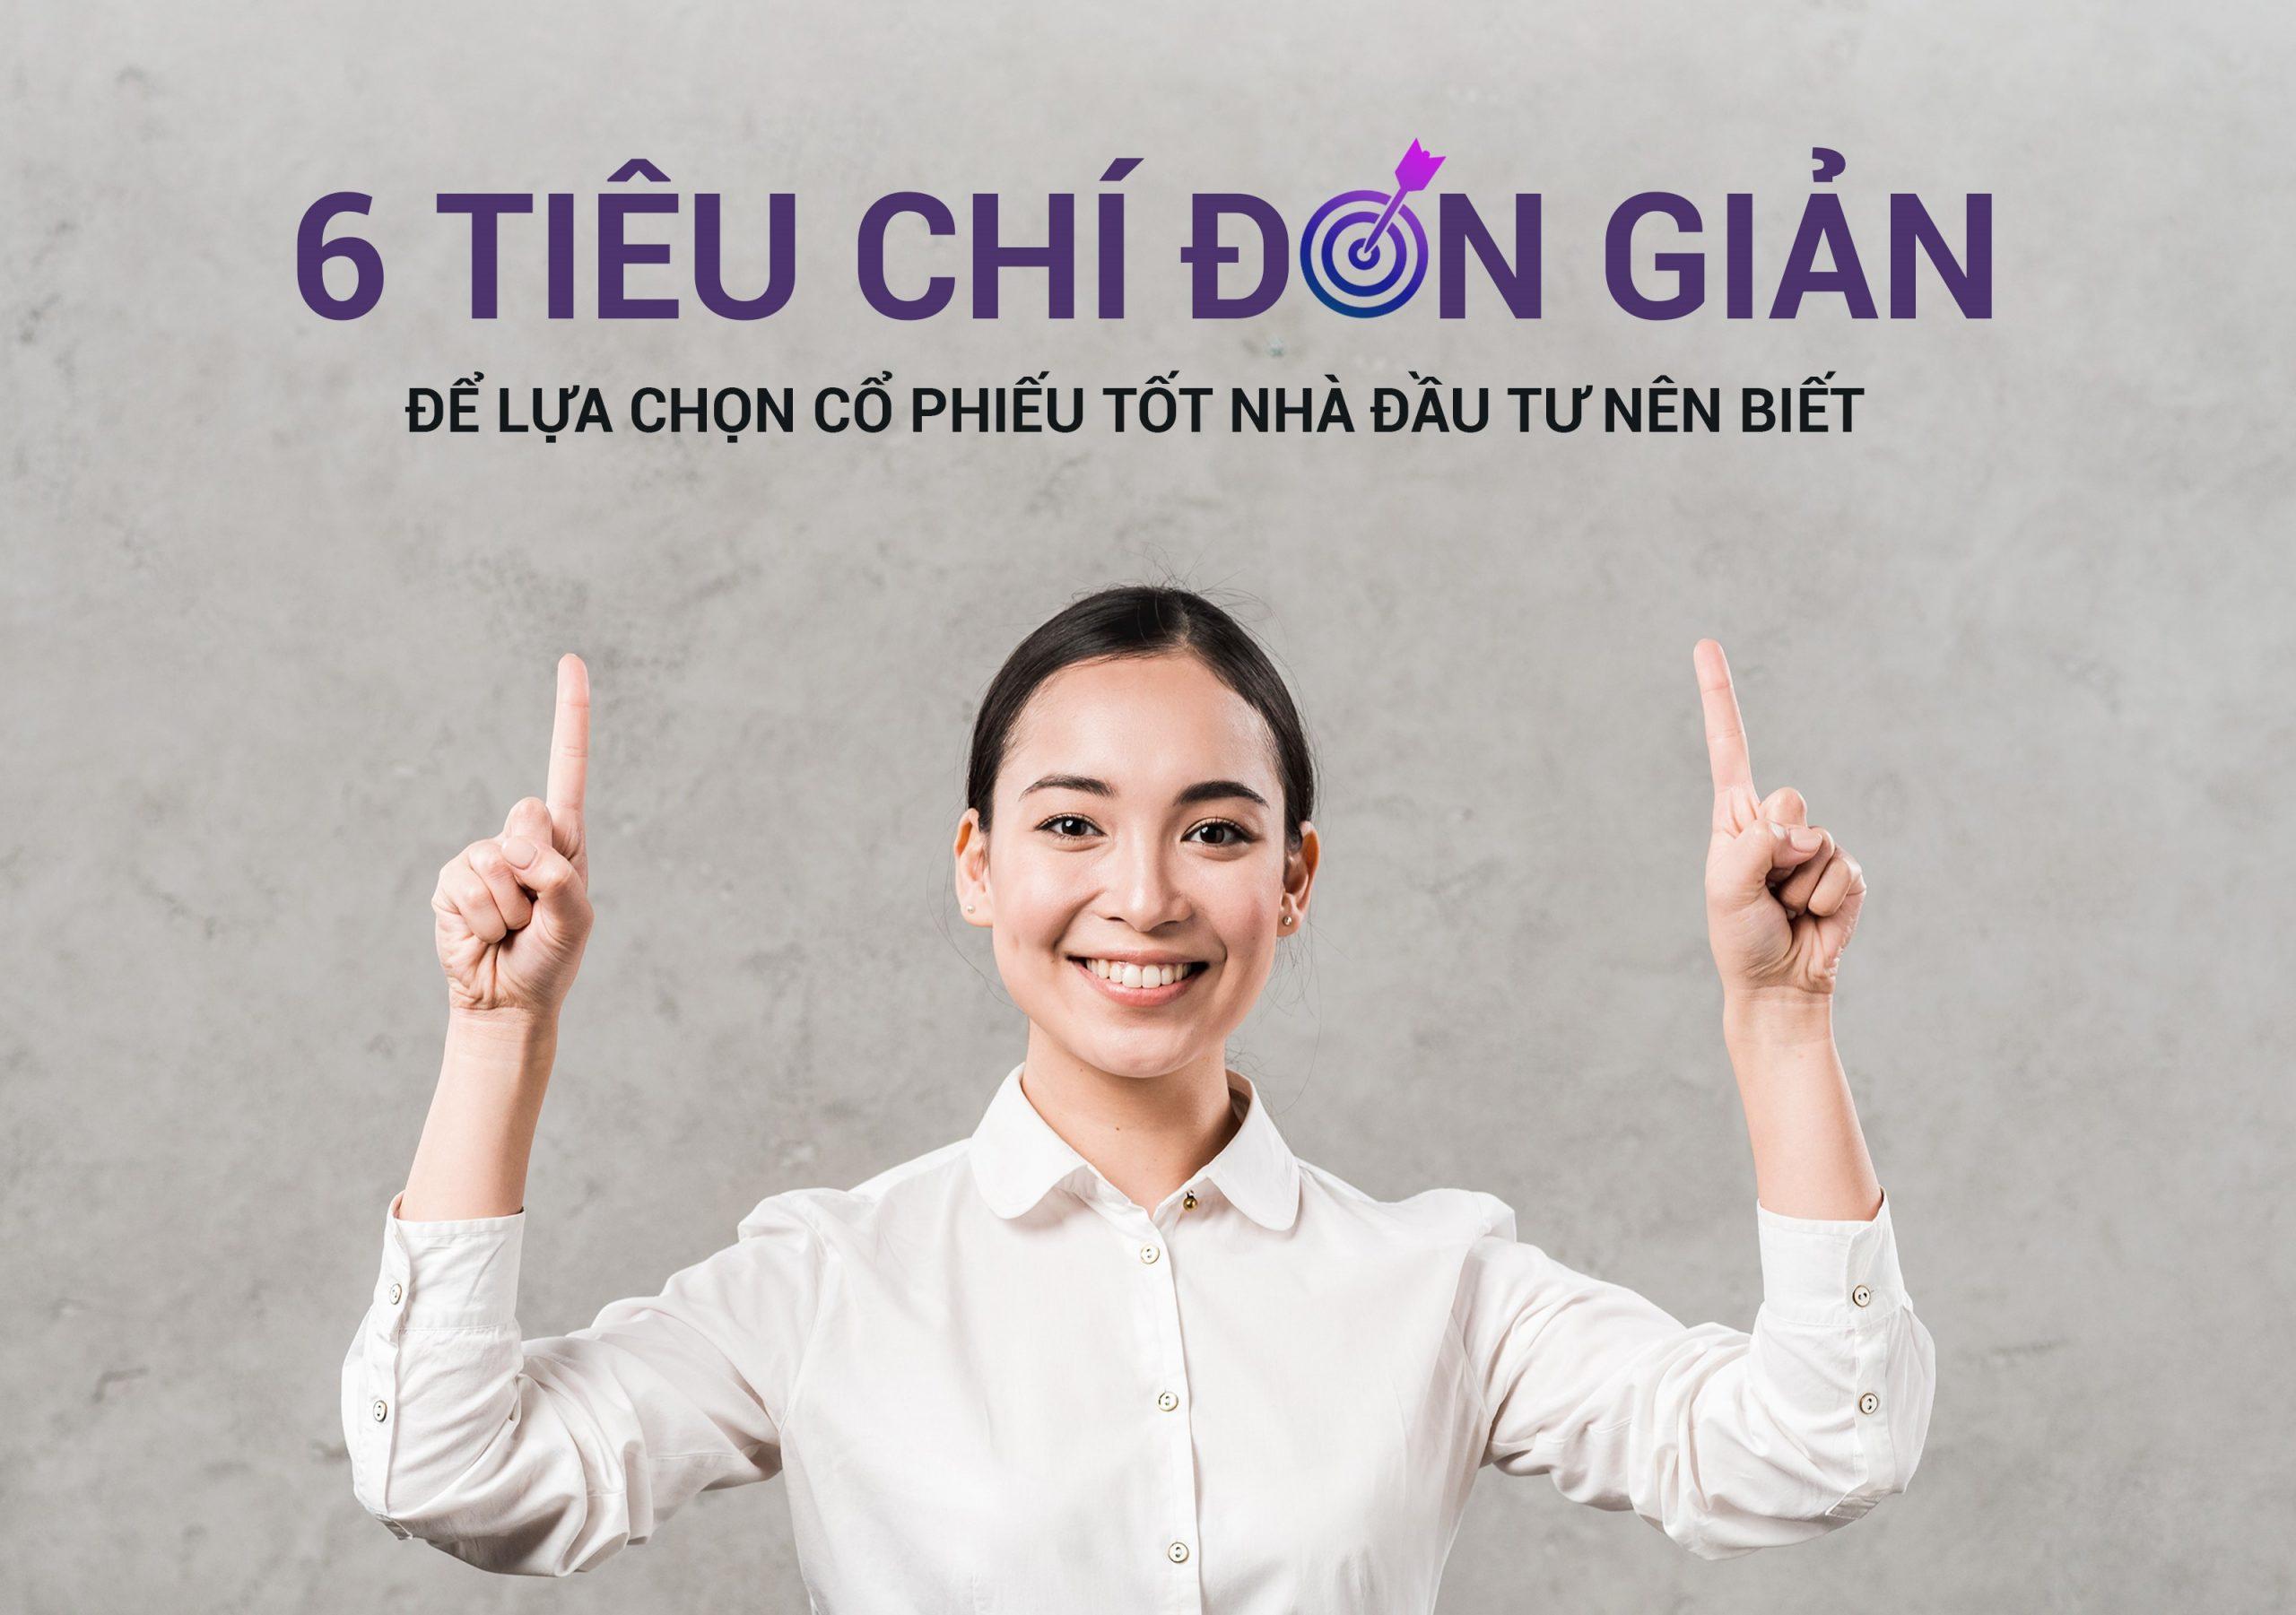 Fanpage TVB 06_10_2021